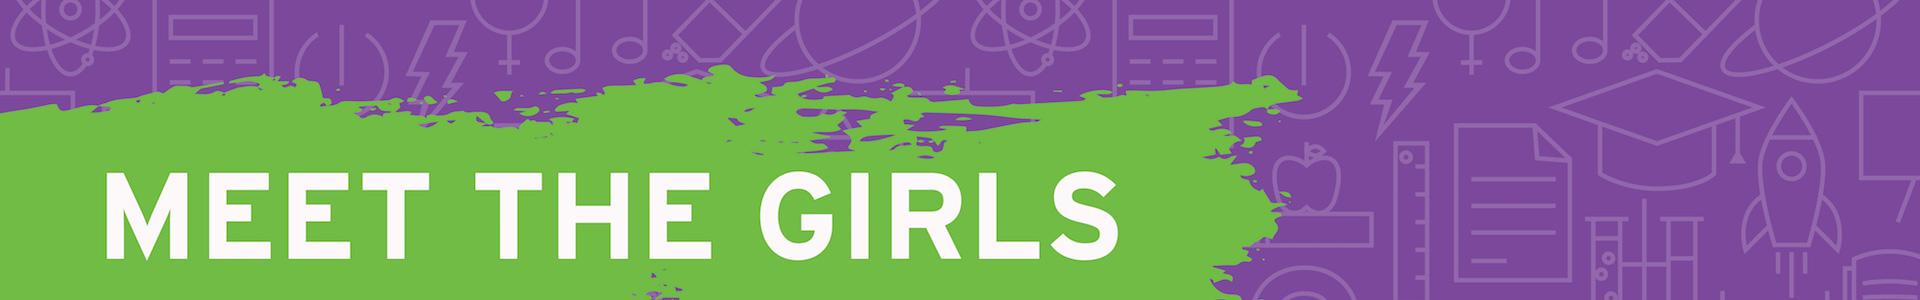 Section Divider: Meet the Girls